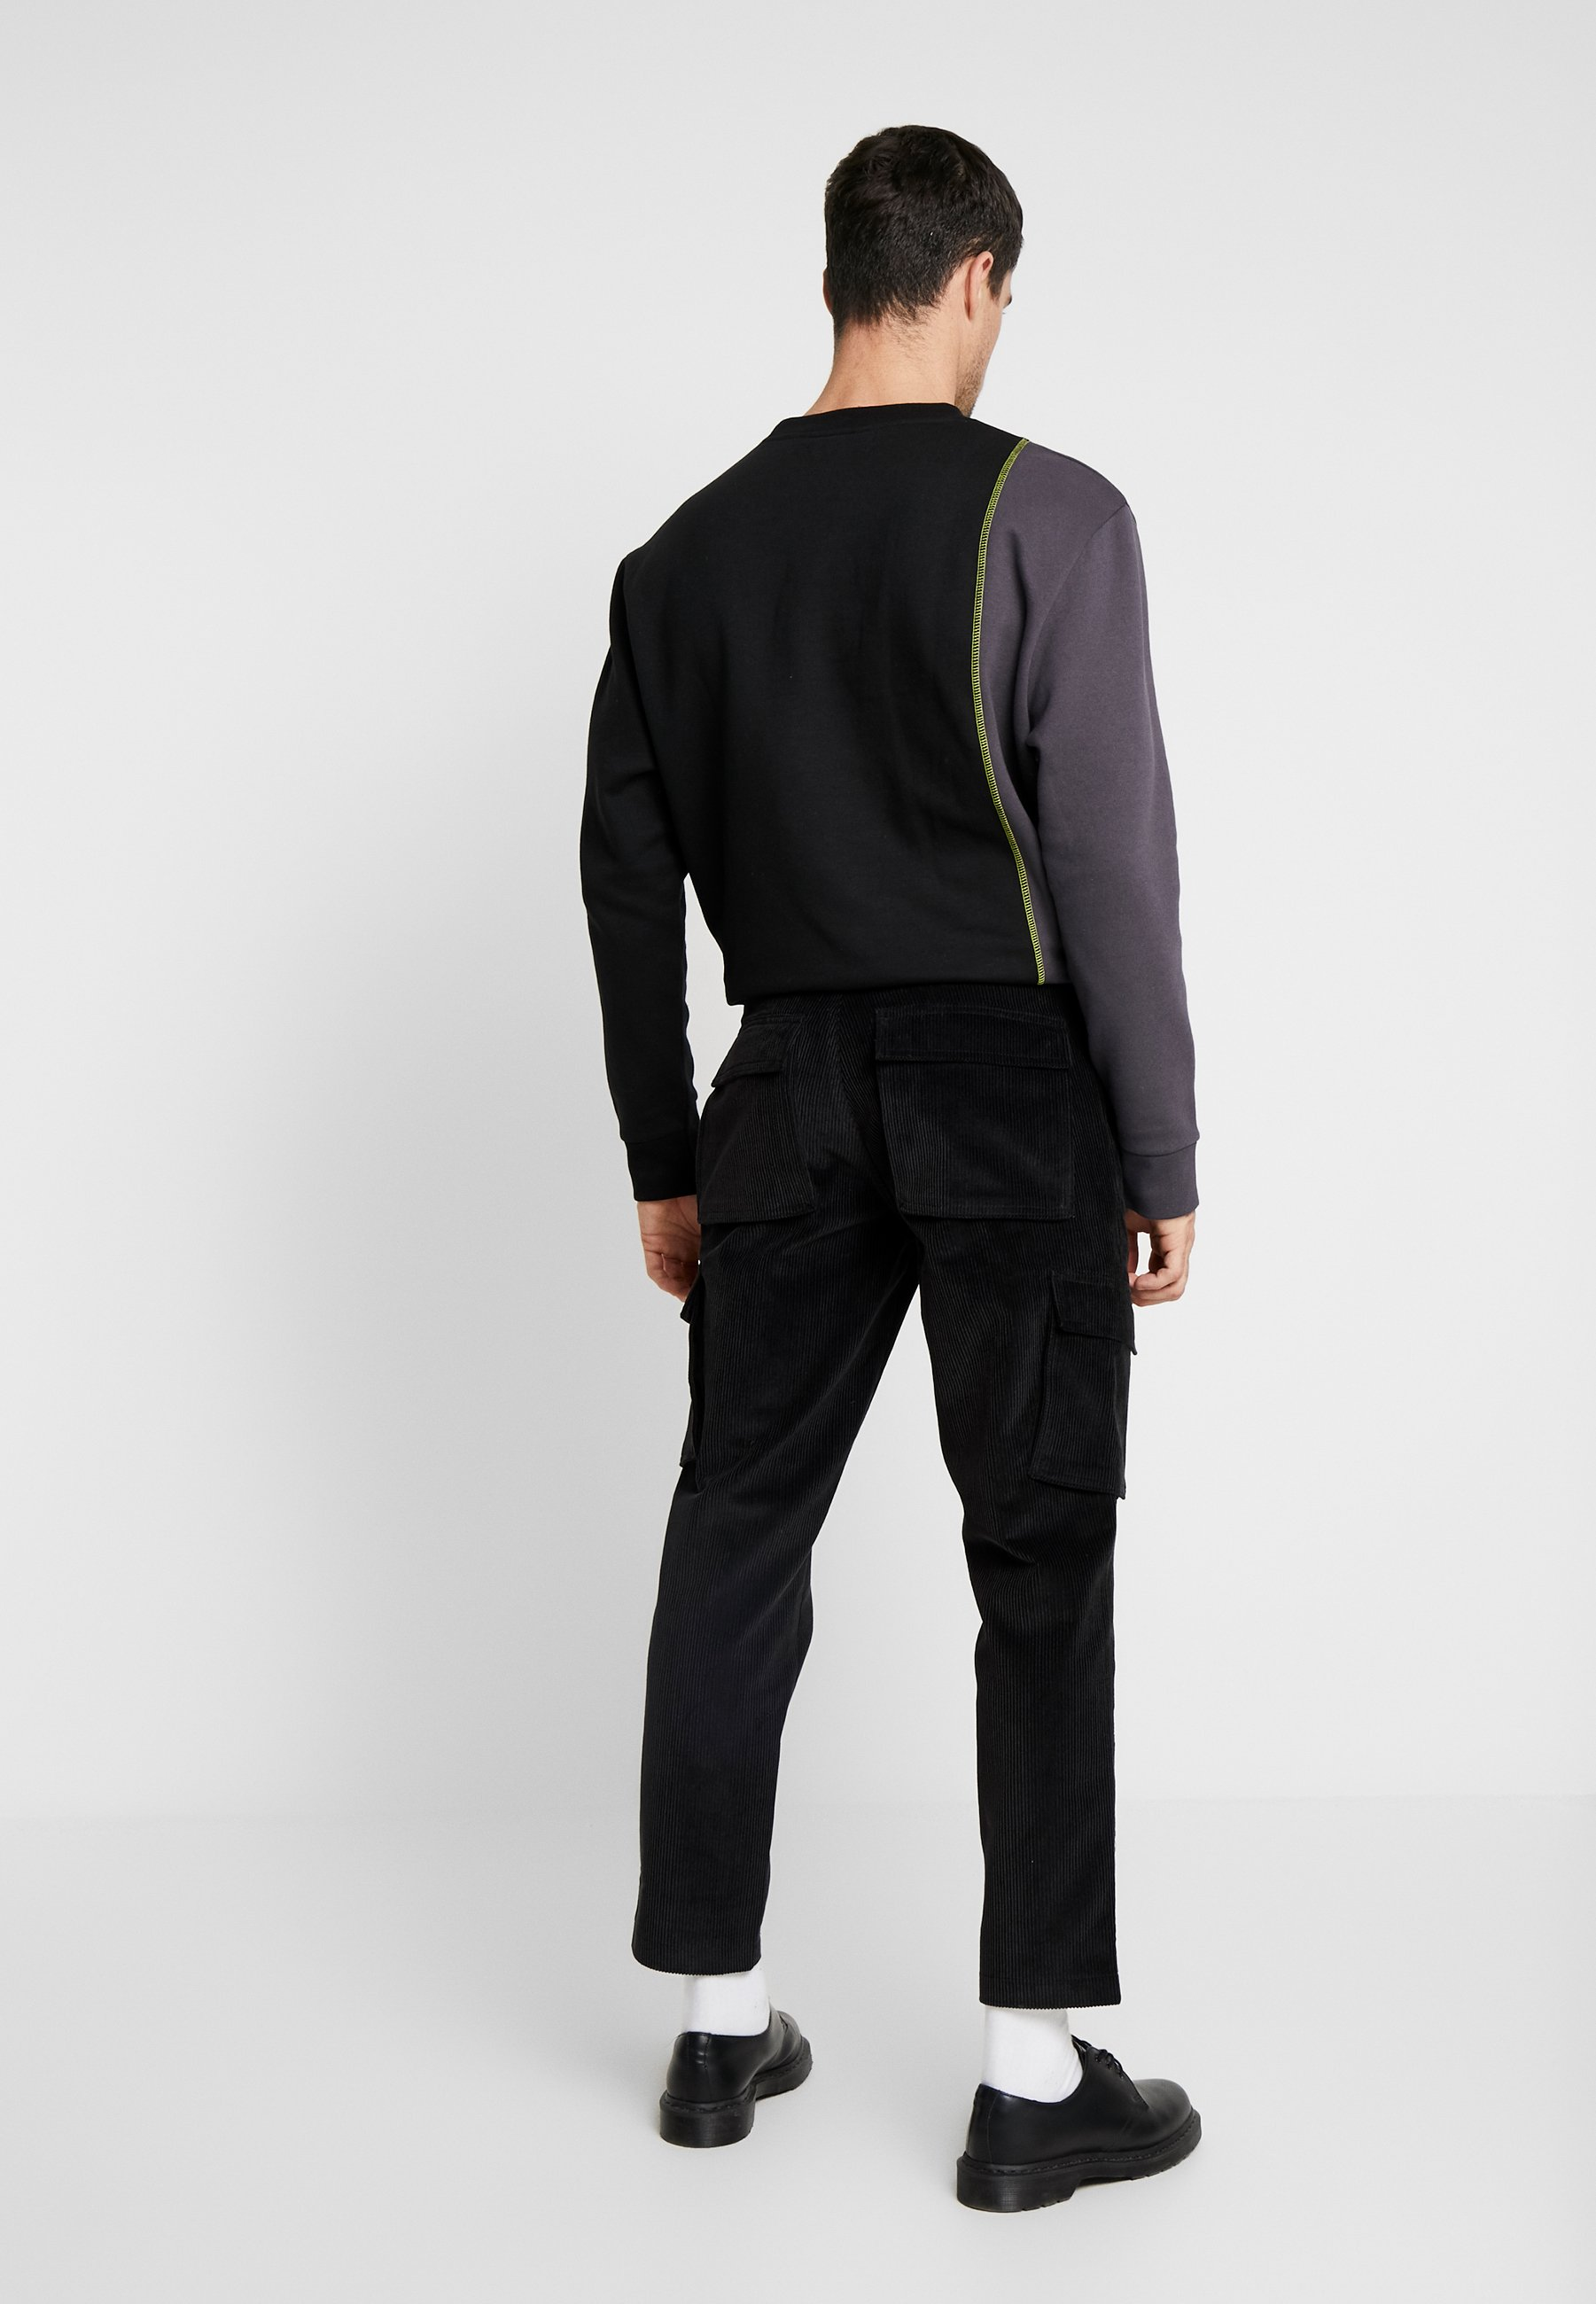 Mennace Utility Trousers - Cargobroek Black 8EjF6UP